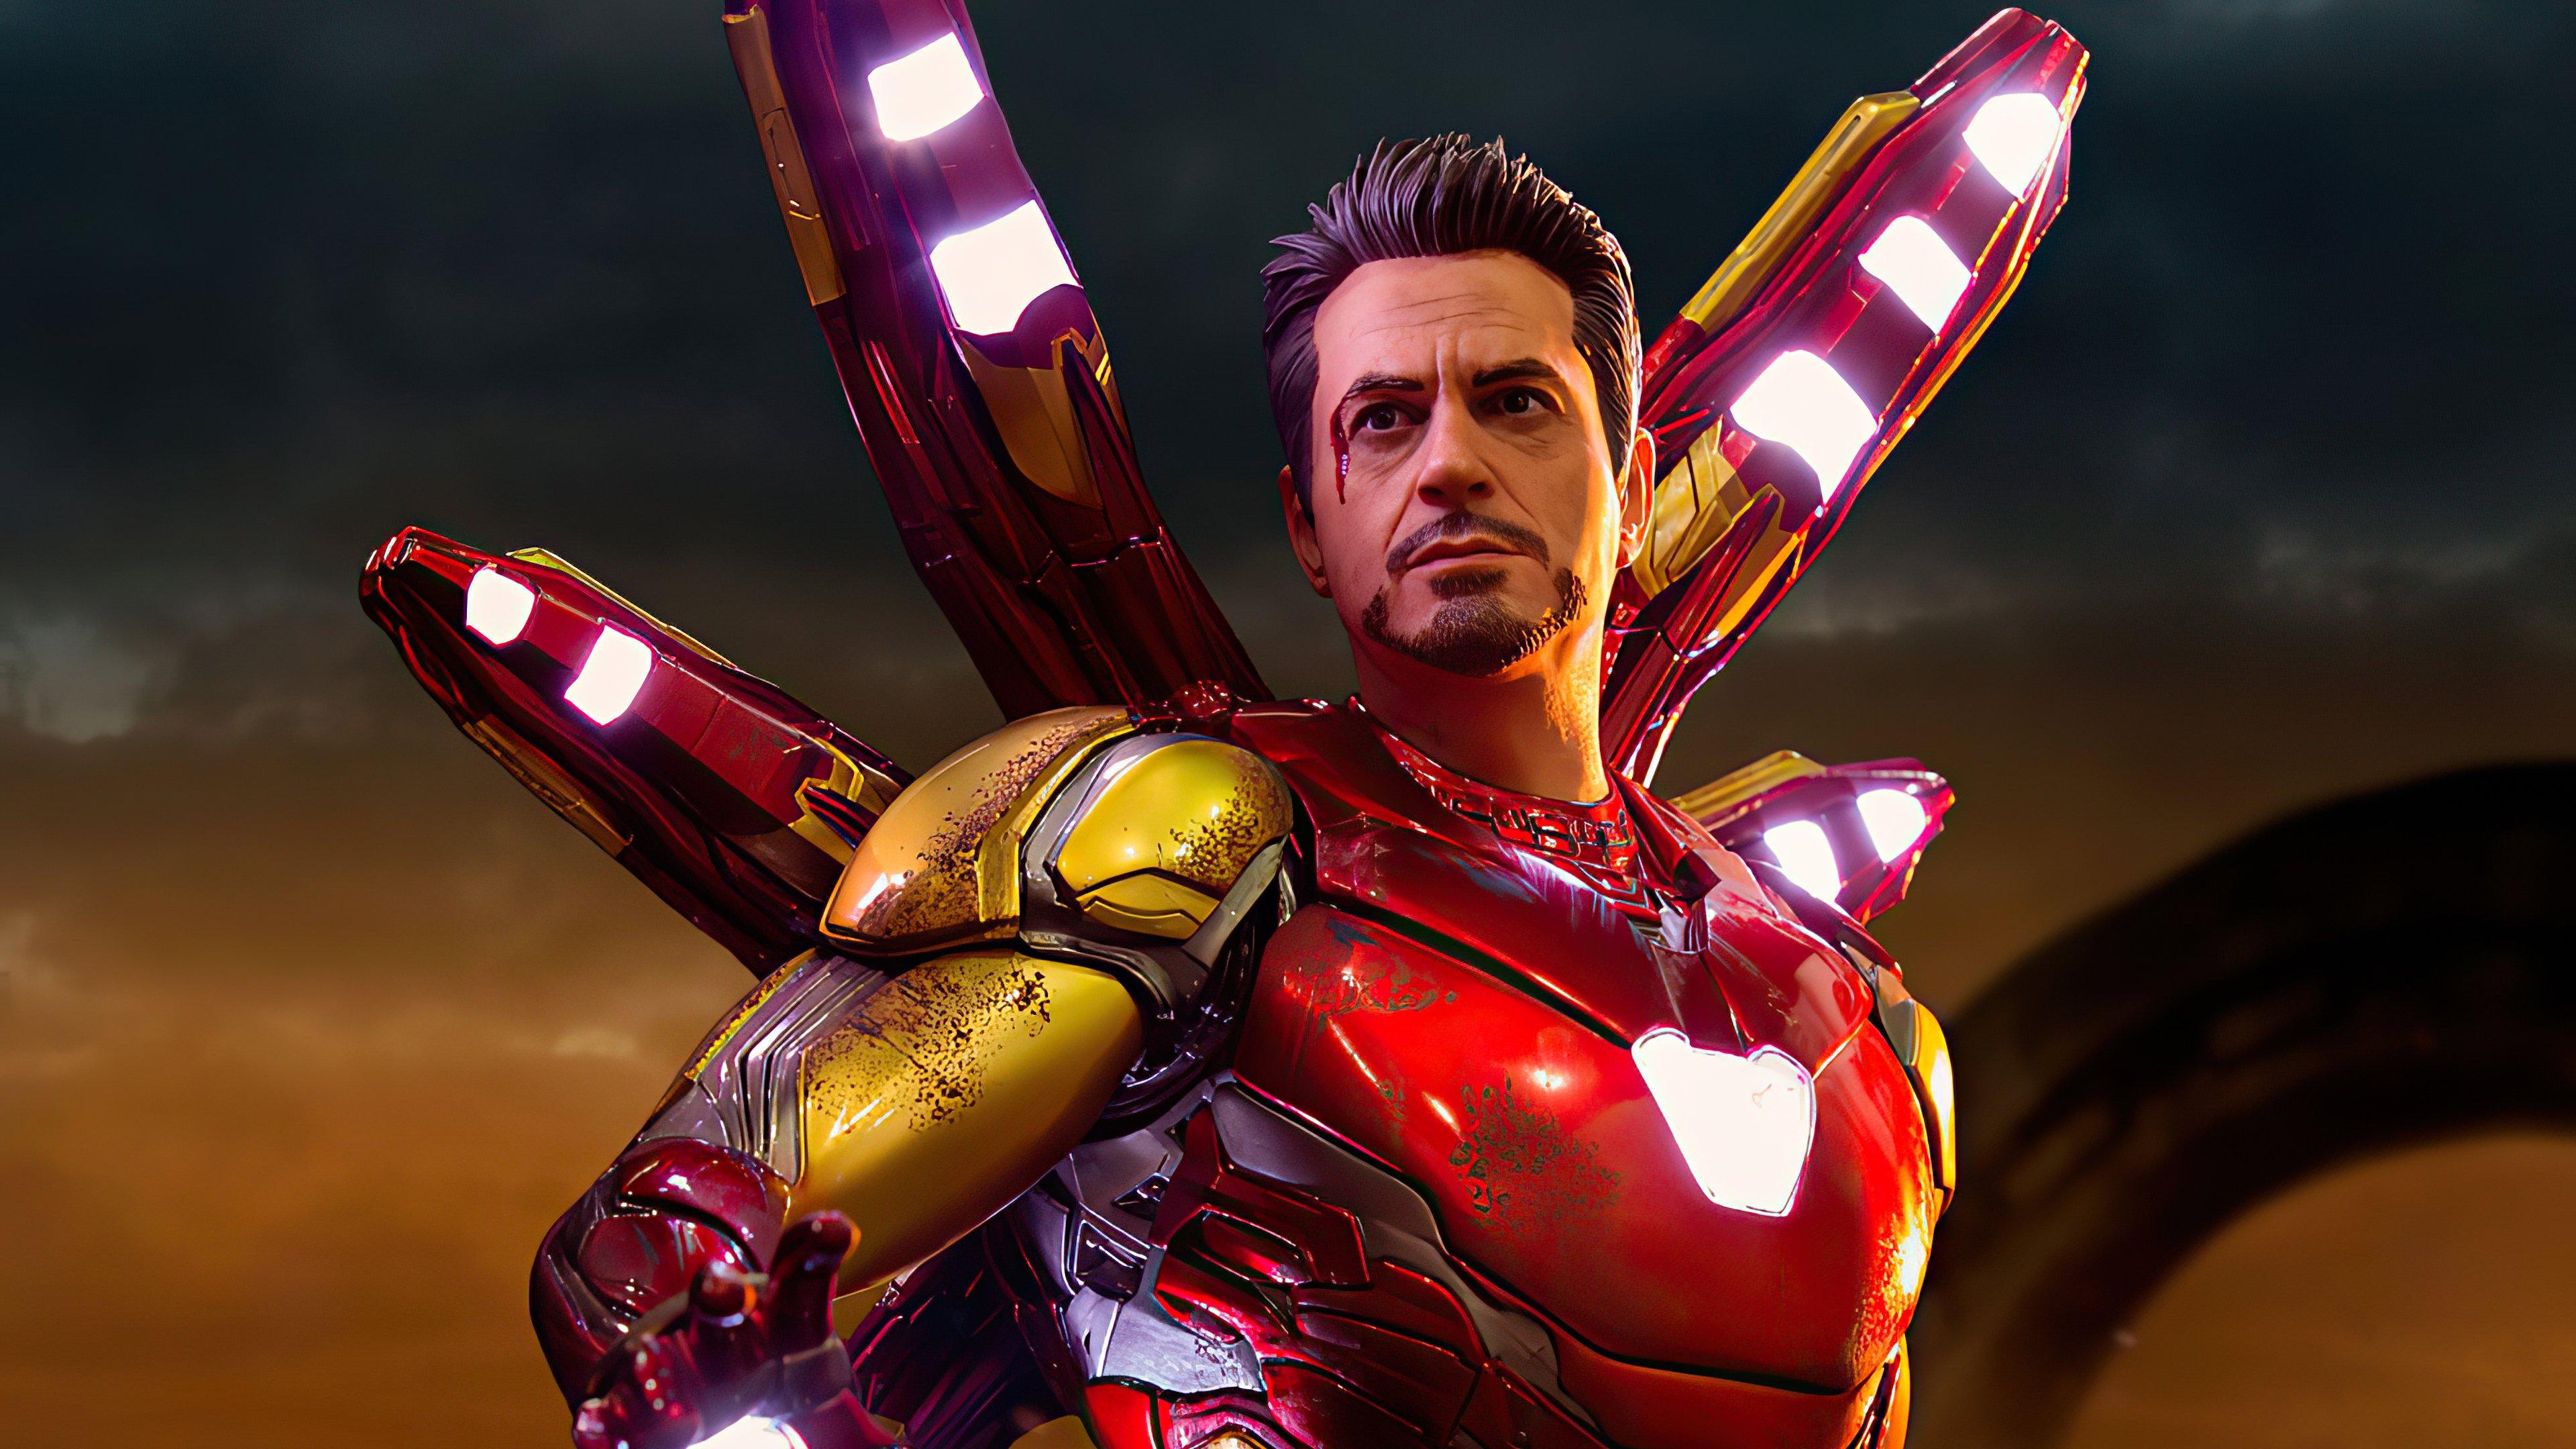 Wallpaper Tony Stark 2020